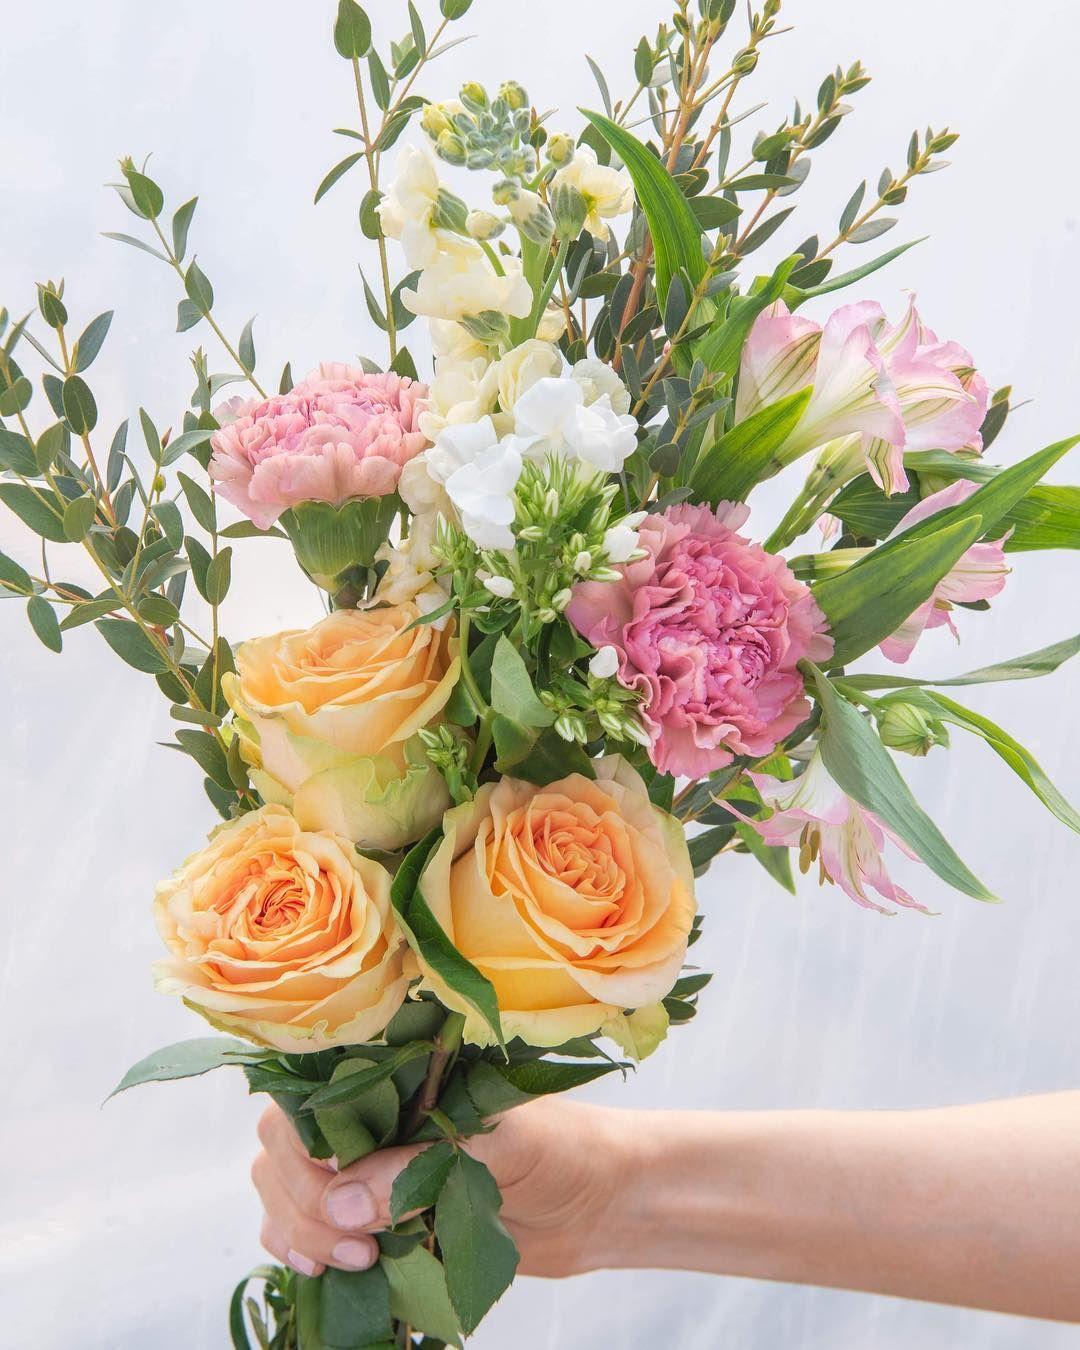 Peach Finesse Roses With Carnation Phlox Stock Alstroemeria Parvifolia Eucalyptus Flower Arrangements Carnations Alstroemeria